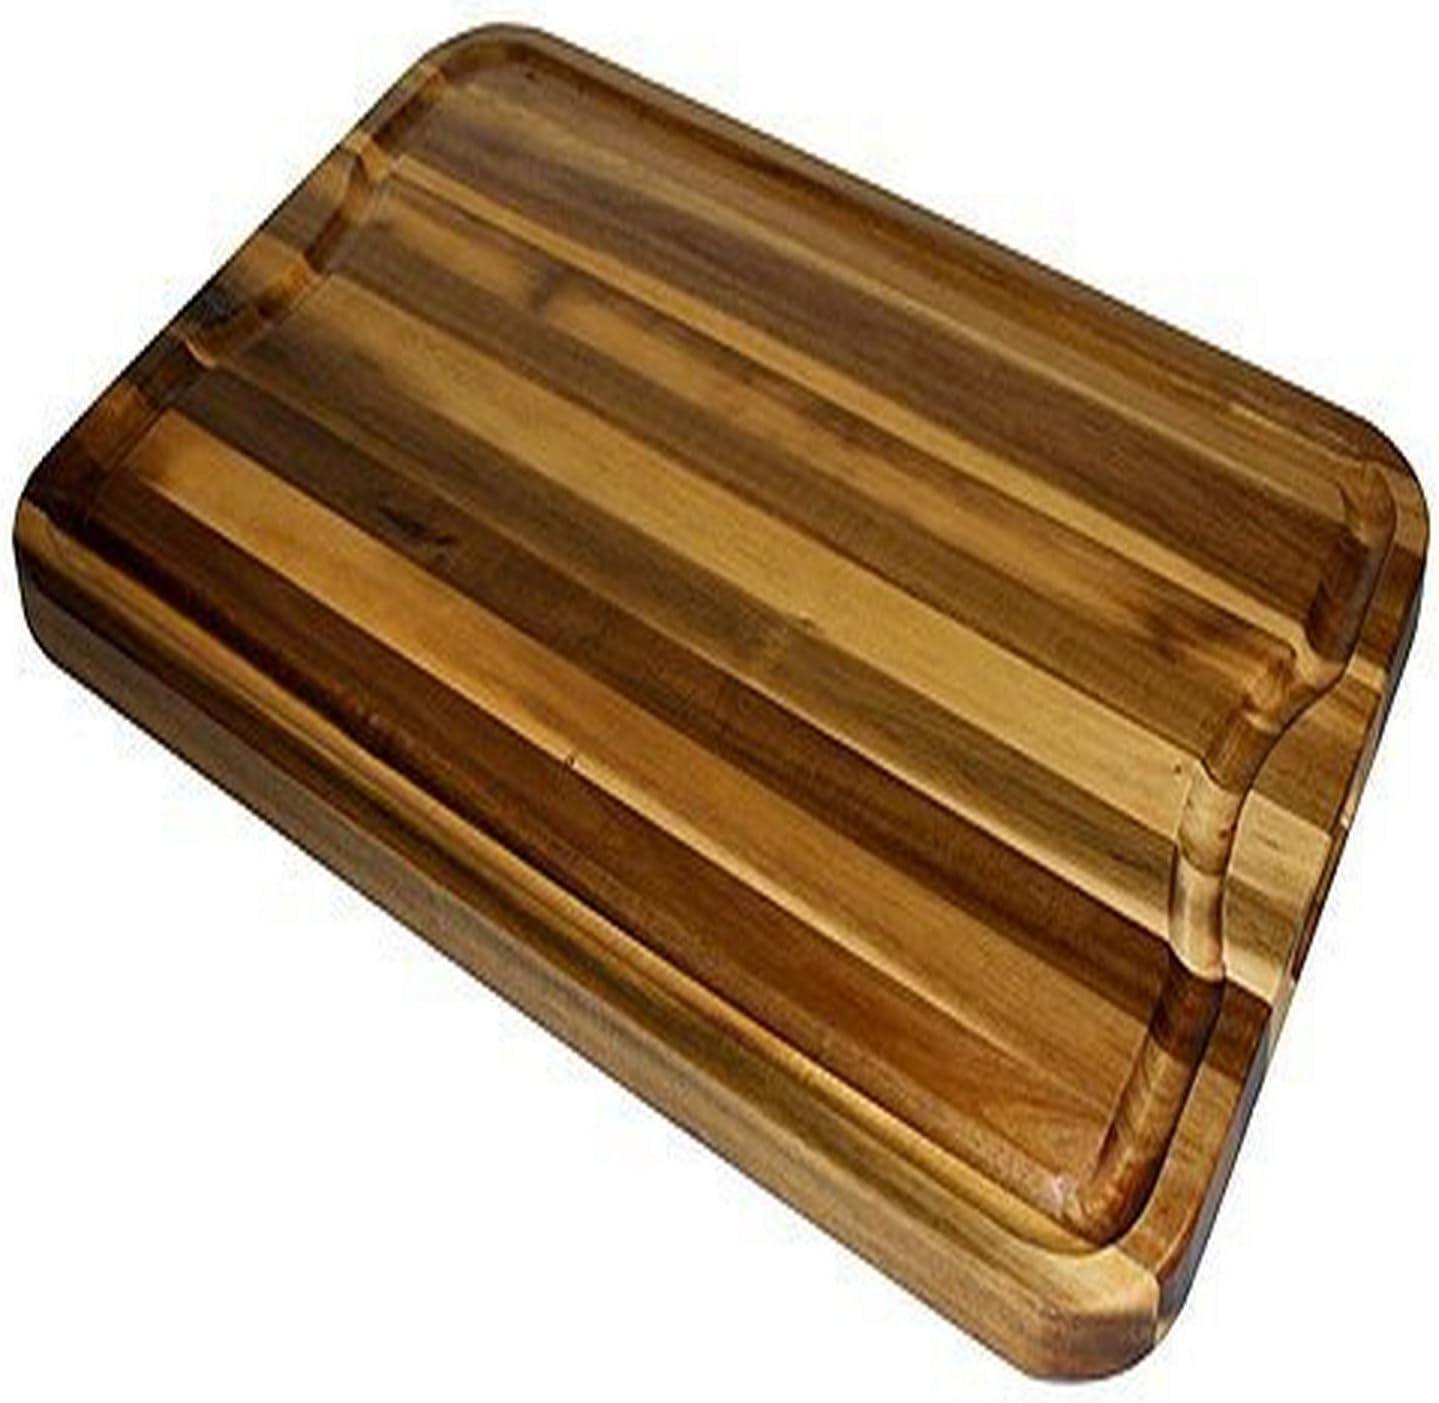 "Mountain Woods Natural bamboo Brown Organic Edge-Grain Hardwood Acacia wooden Cutting Board w/Juice groove - 24"" x 16"" x 1"""